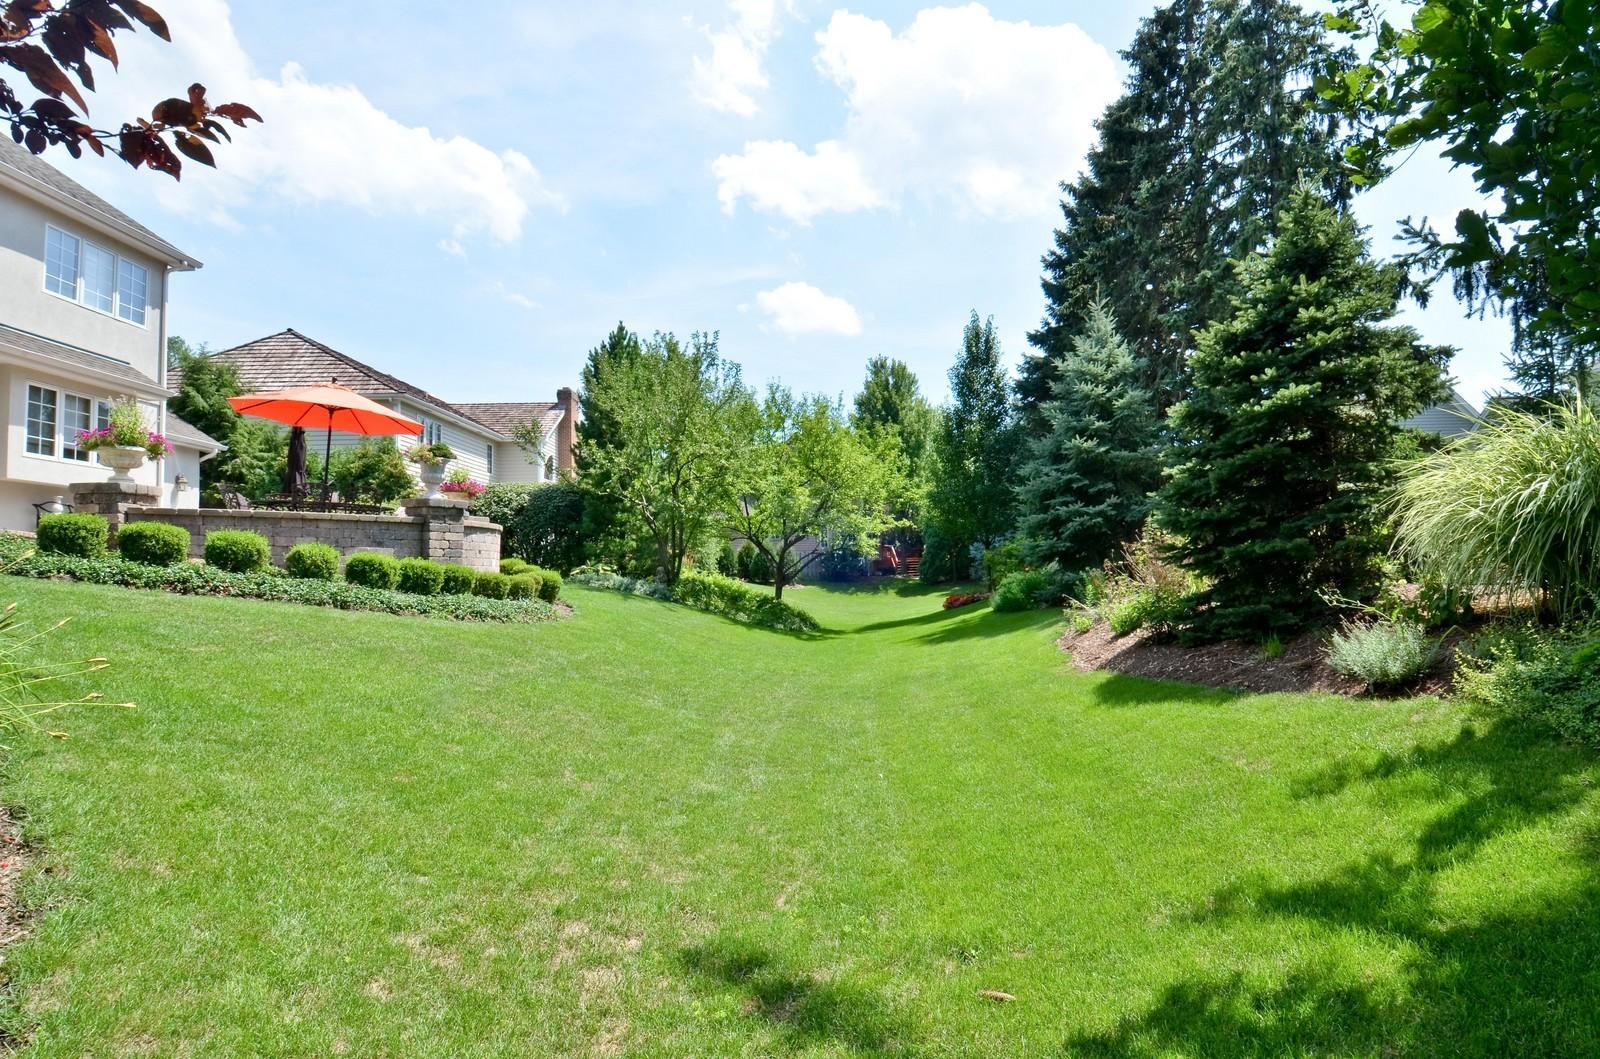 Real Estate Photography - 1492 Lloyd, Wheaton, IL, 60189 - Location 1